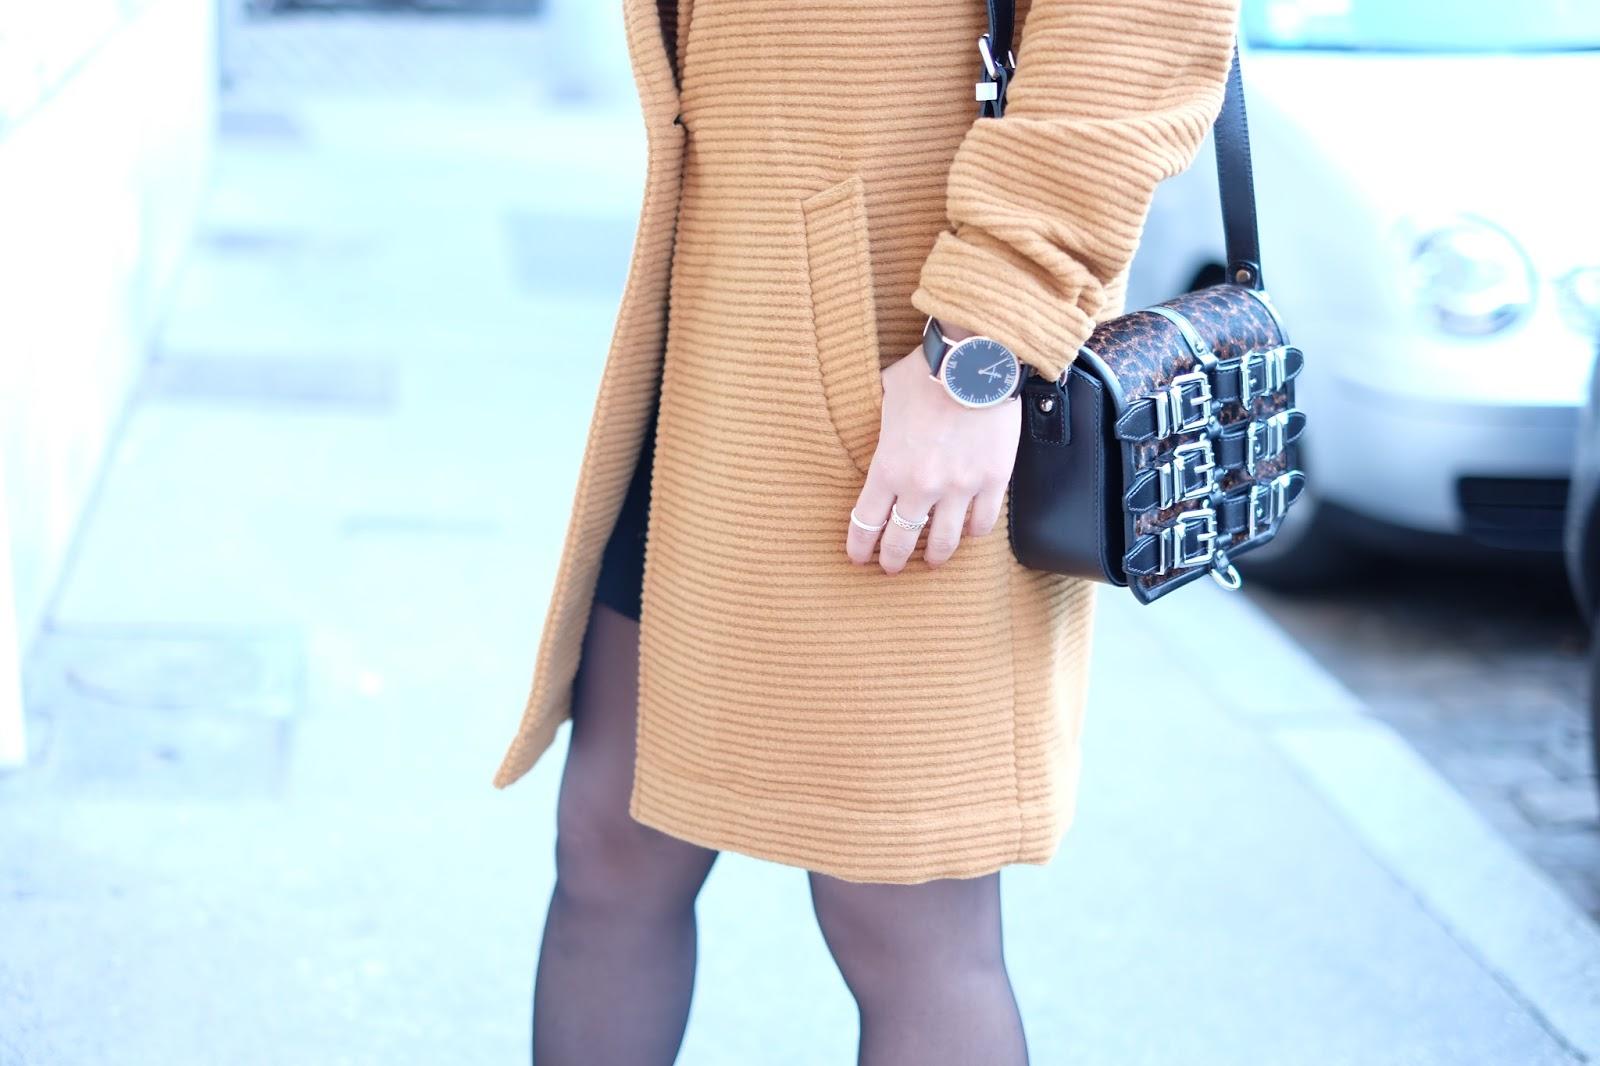 blog mode, blogueuse mode, french blogger, grain de malice, les petites shanghaiennes, mode, blogueuse lyonnaise, modeuse